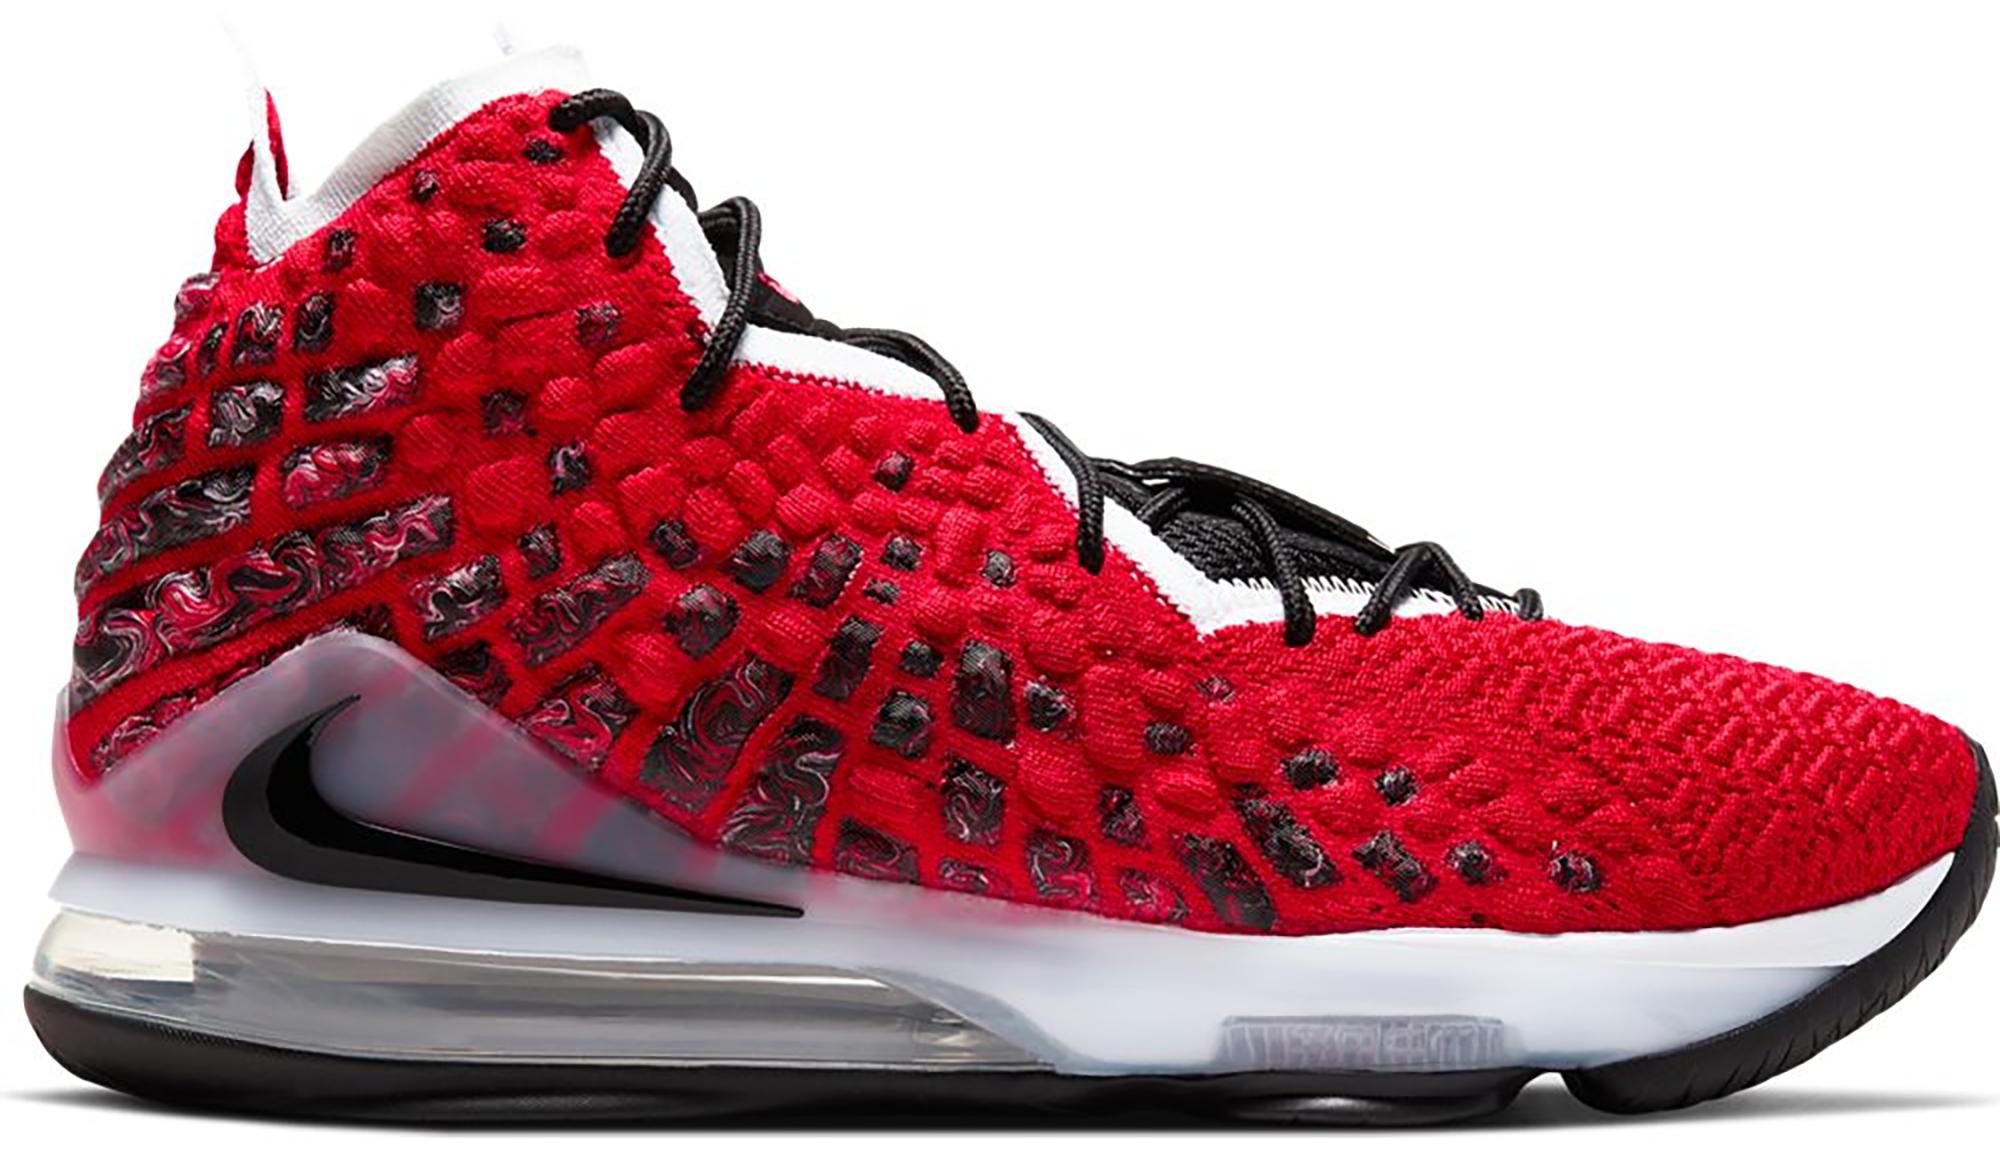 Nike LeBron 17 Uptempo - BQ3177-601